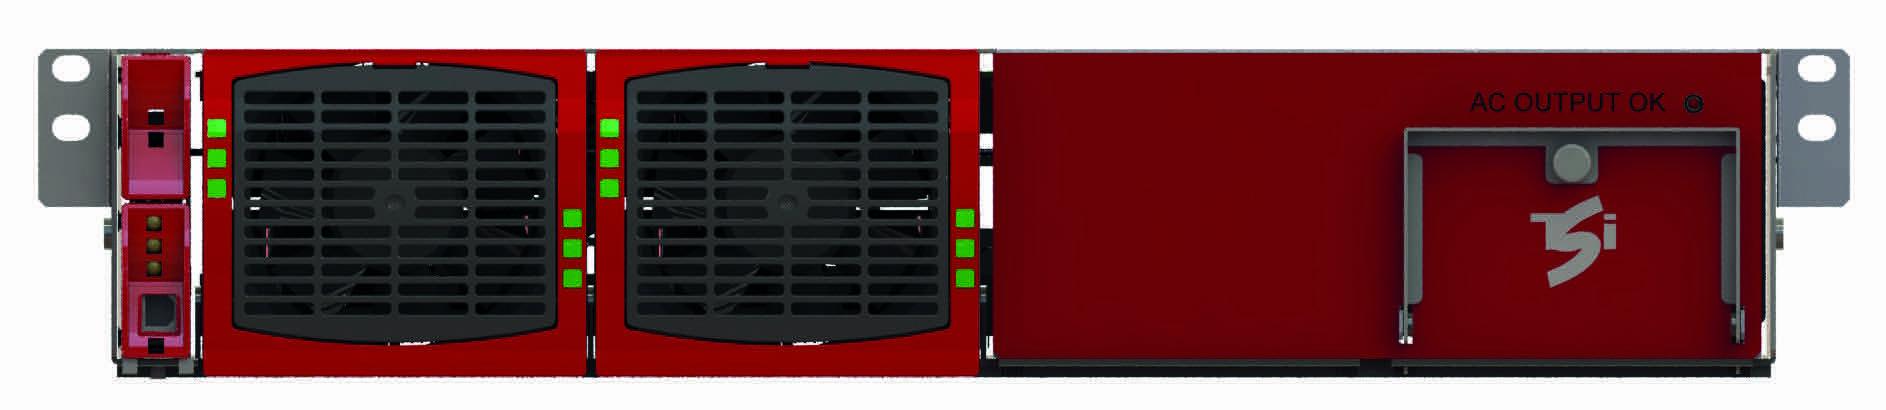 CE+T Y-one EPC 48V 230VAC 500VA Stand Alone Inverter Pure Sine Wave Inverter